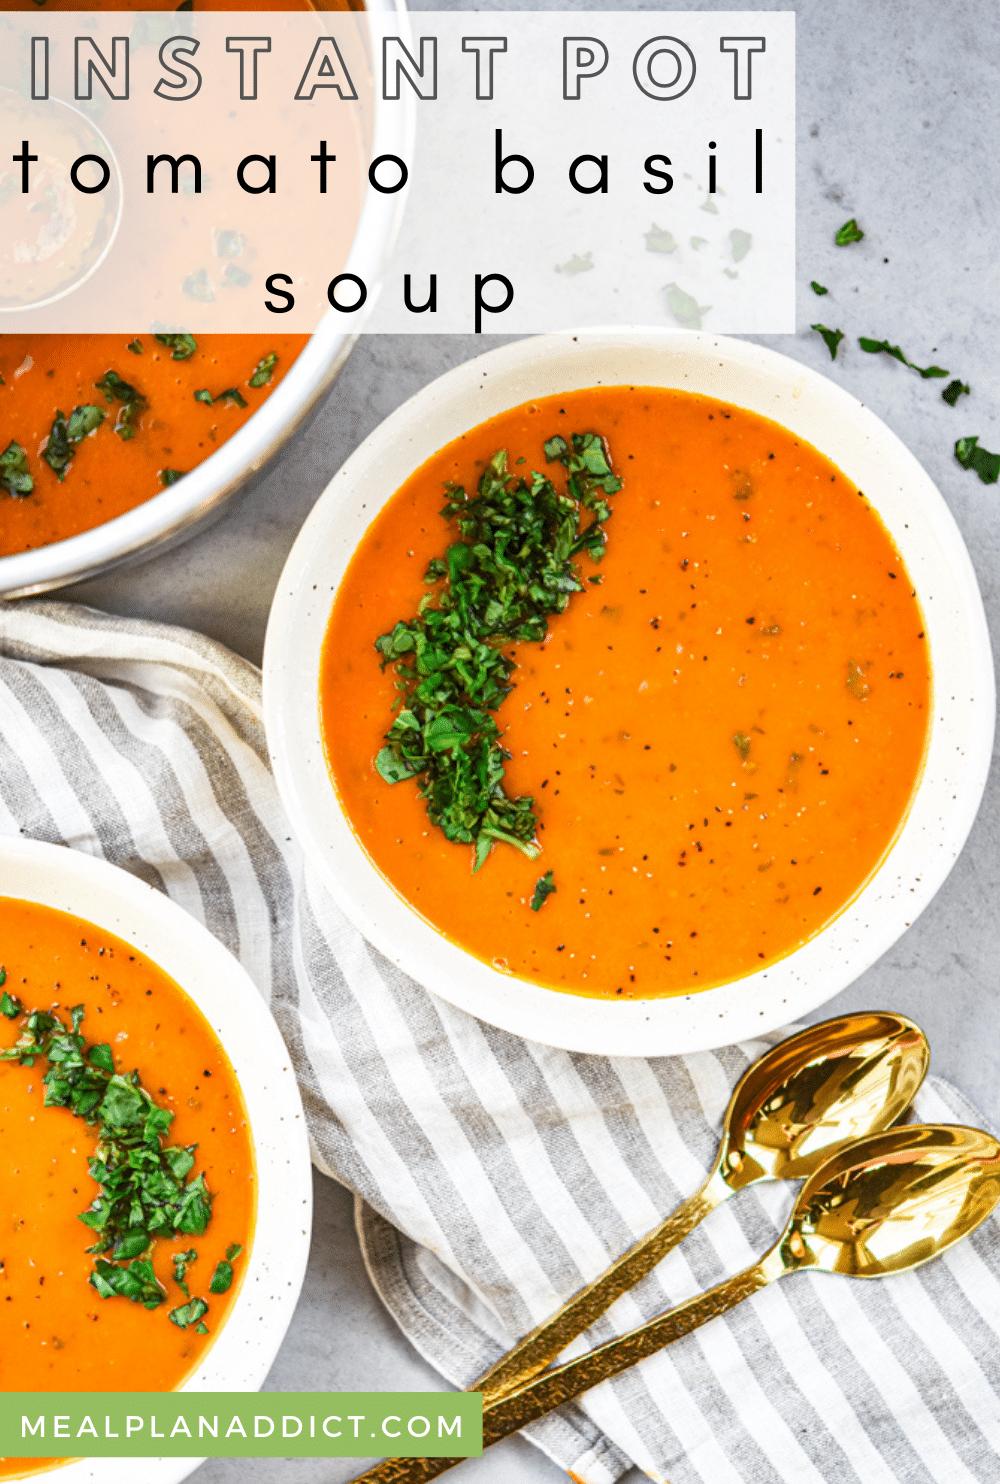 Simple Instant Pot Tomato Basil Soup Recipe   Meal Plan Addict